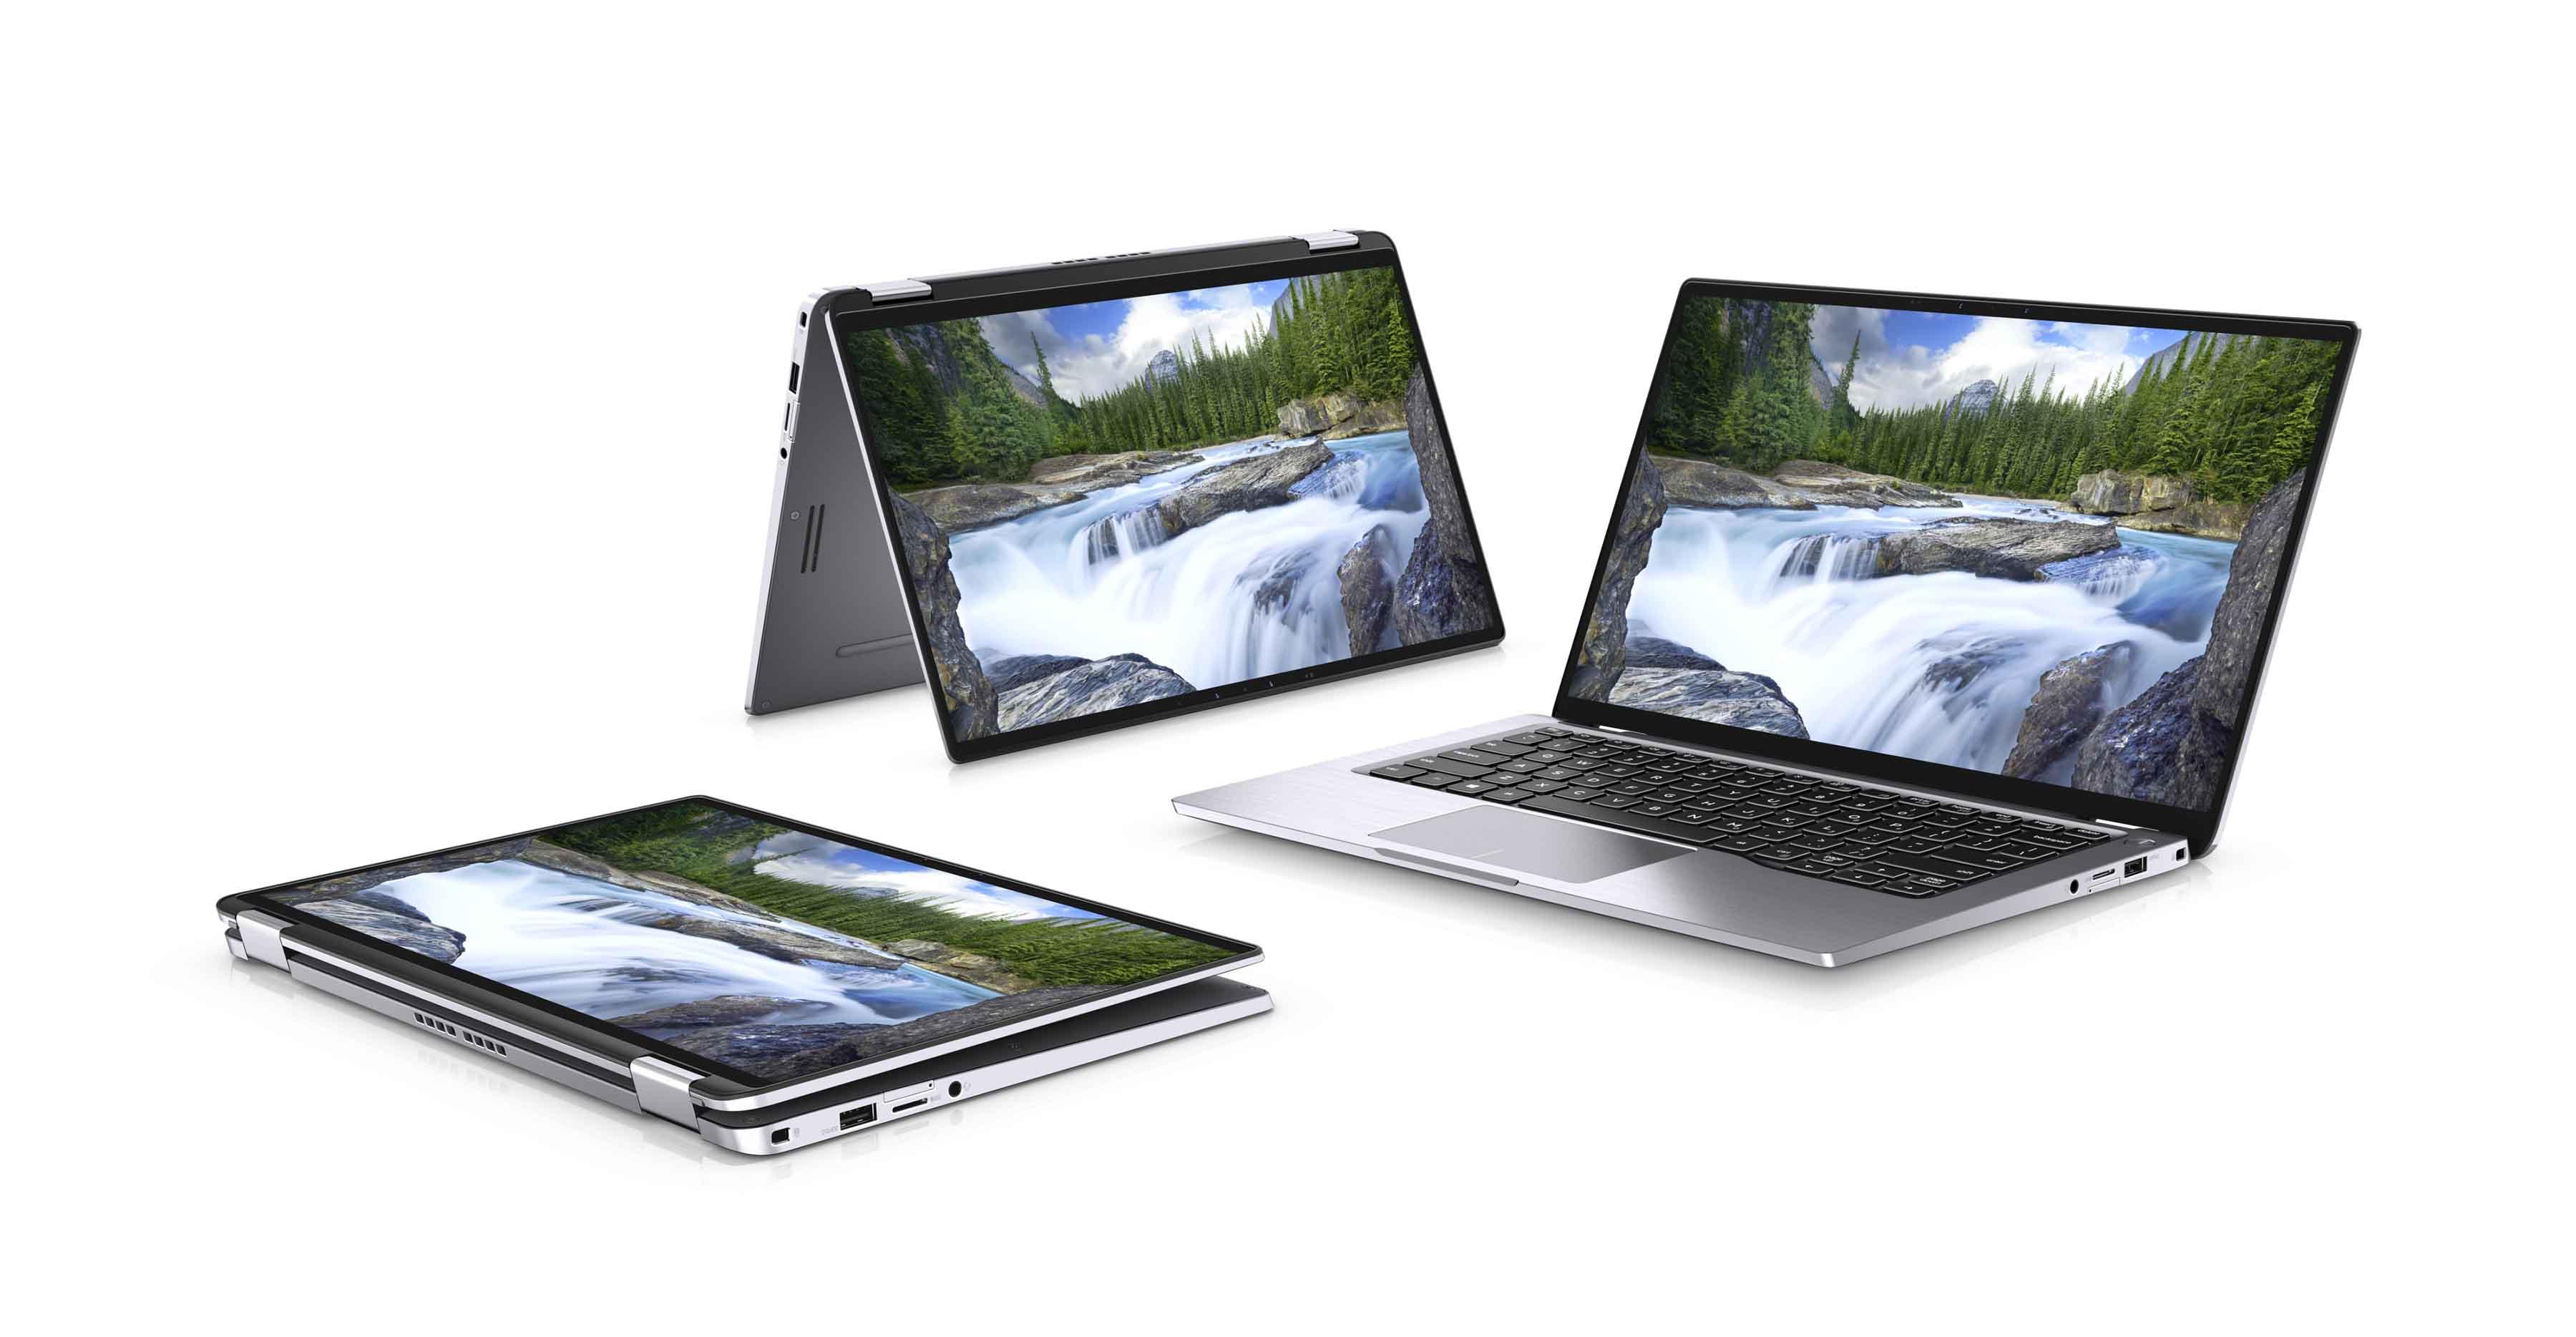 CES 2019 - Dell เปิดตัวนวัตกรรมพีซี Alienware, Latitude, XPS